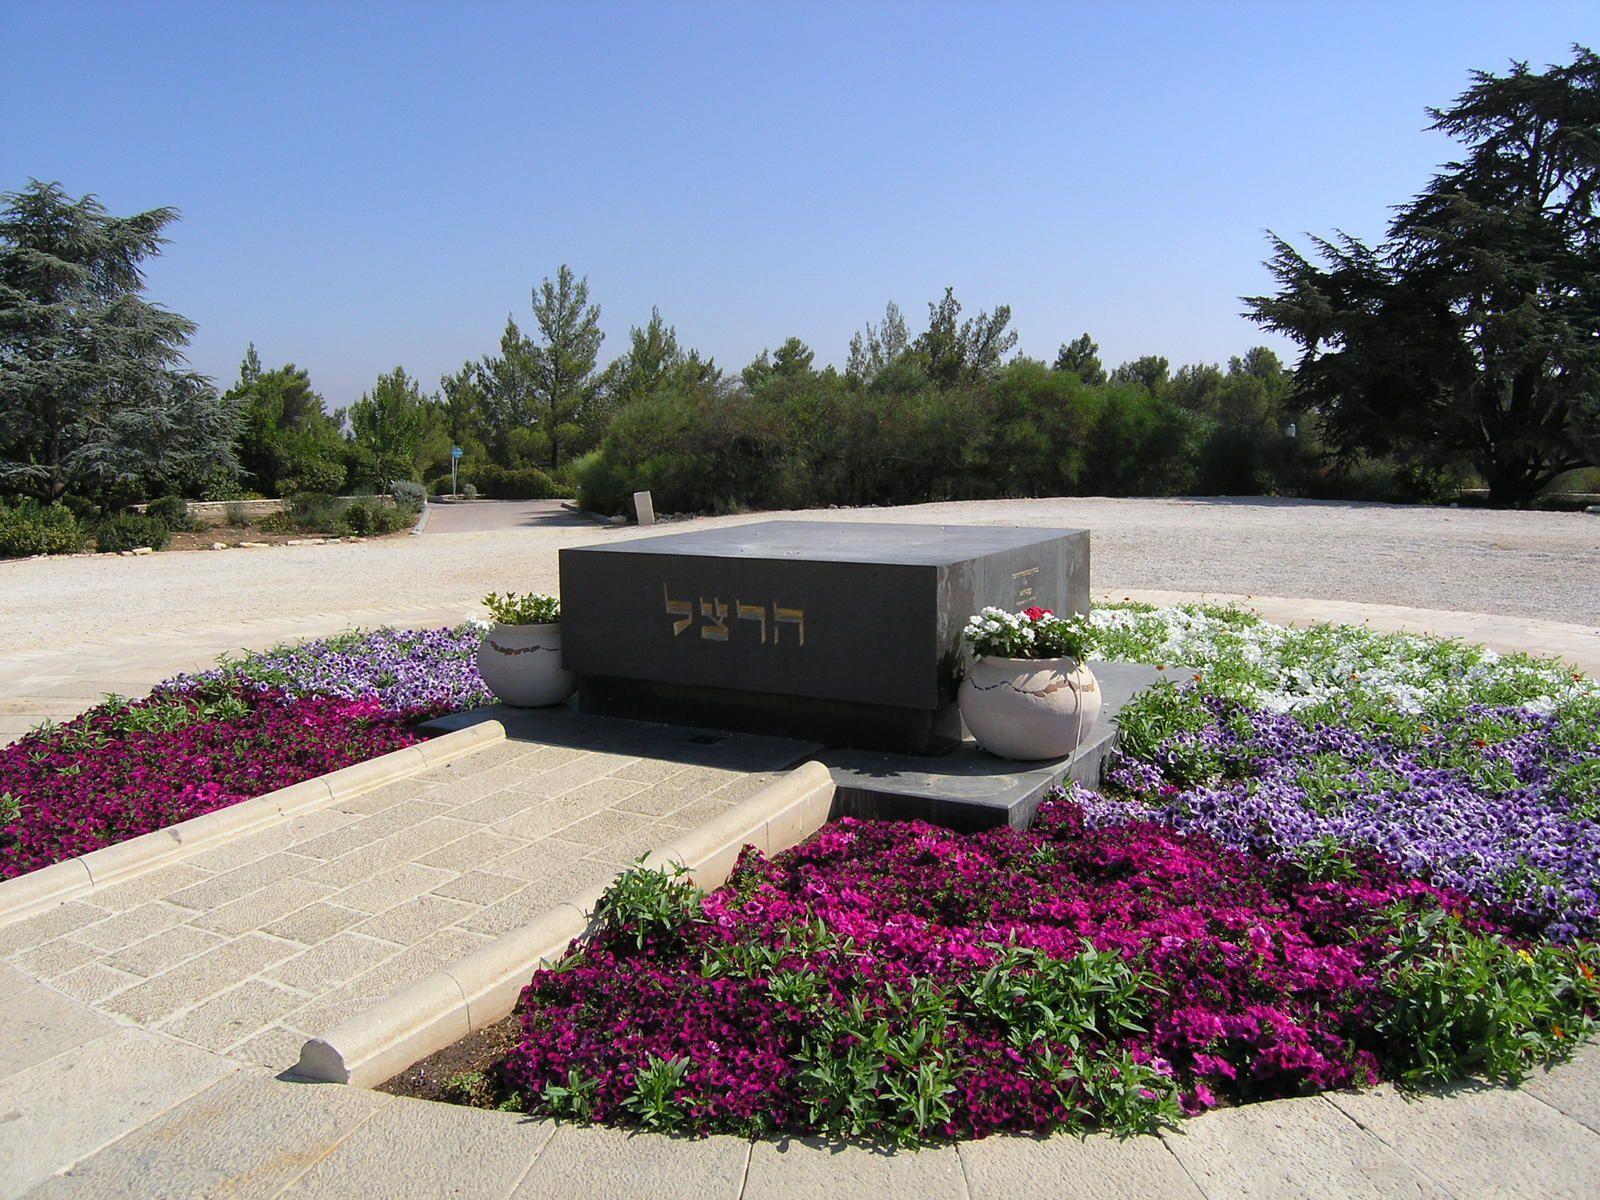 La tombe de Théodor Herzl à Jérusalem